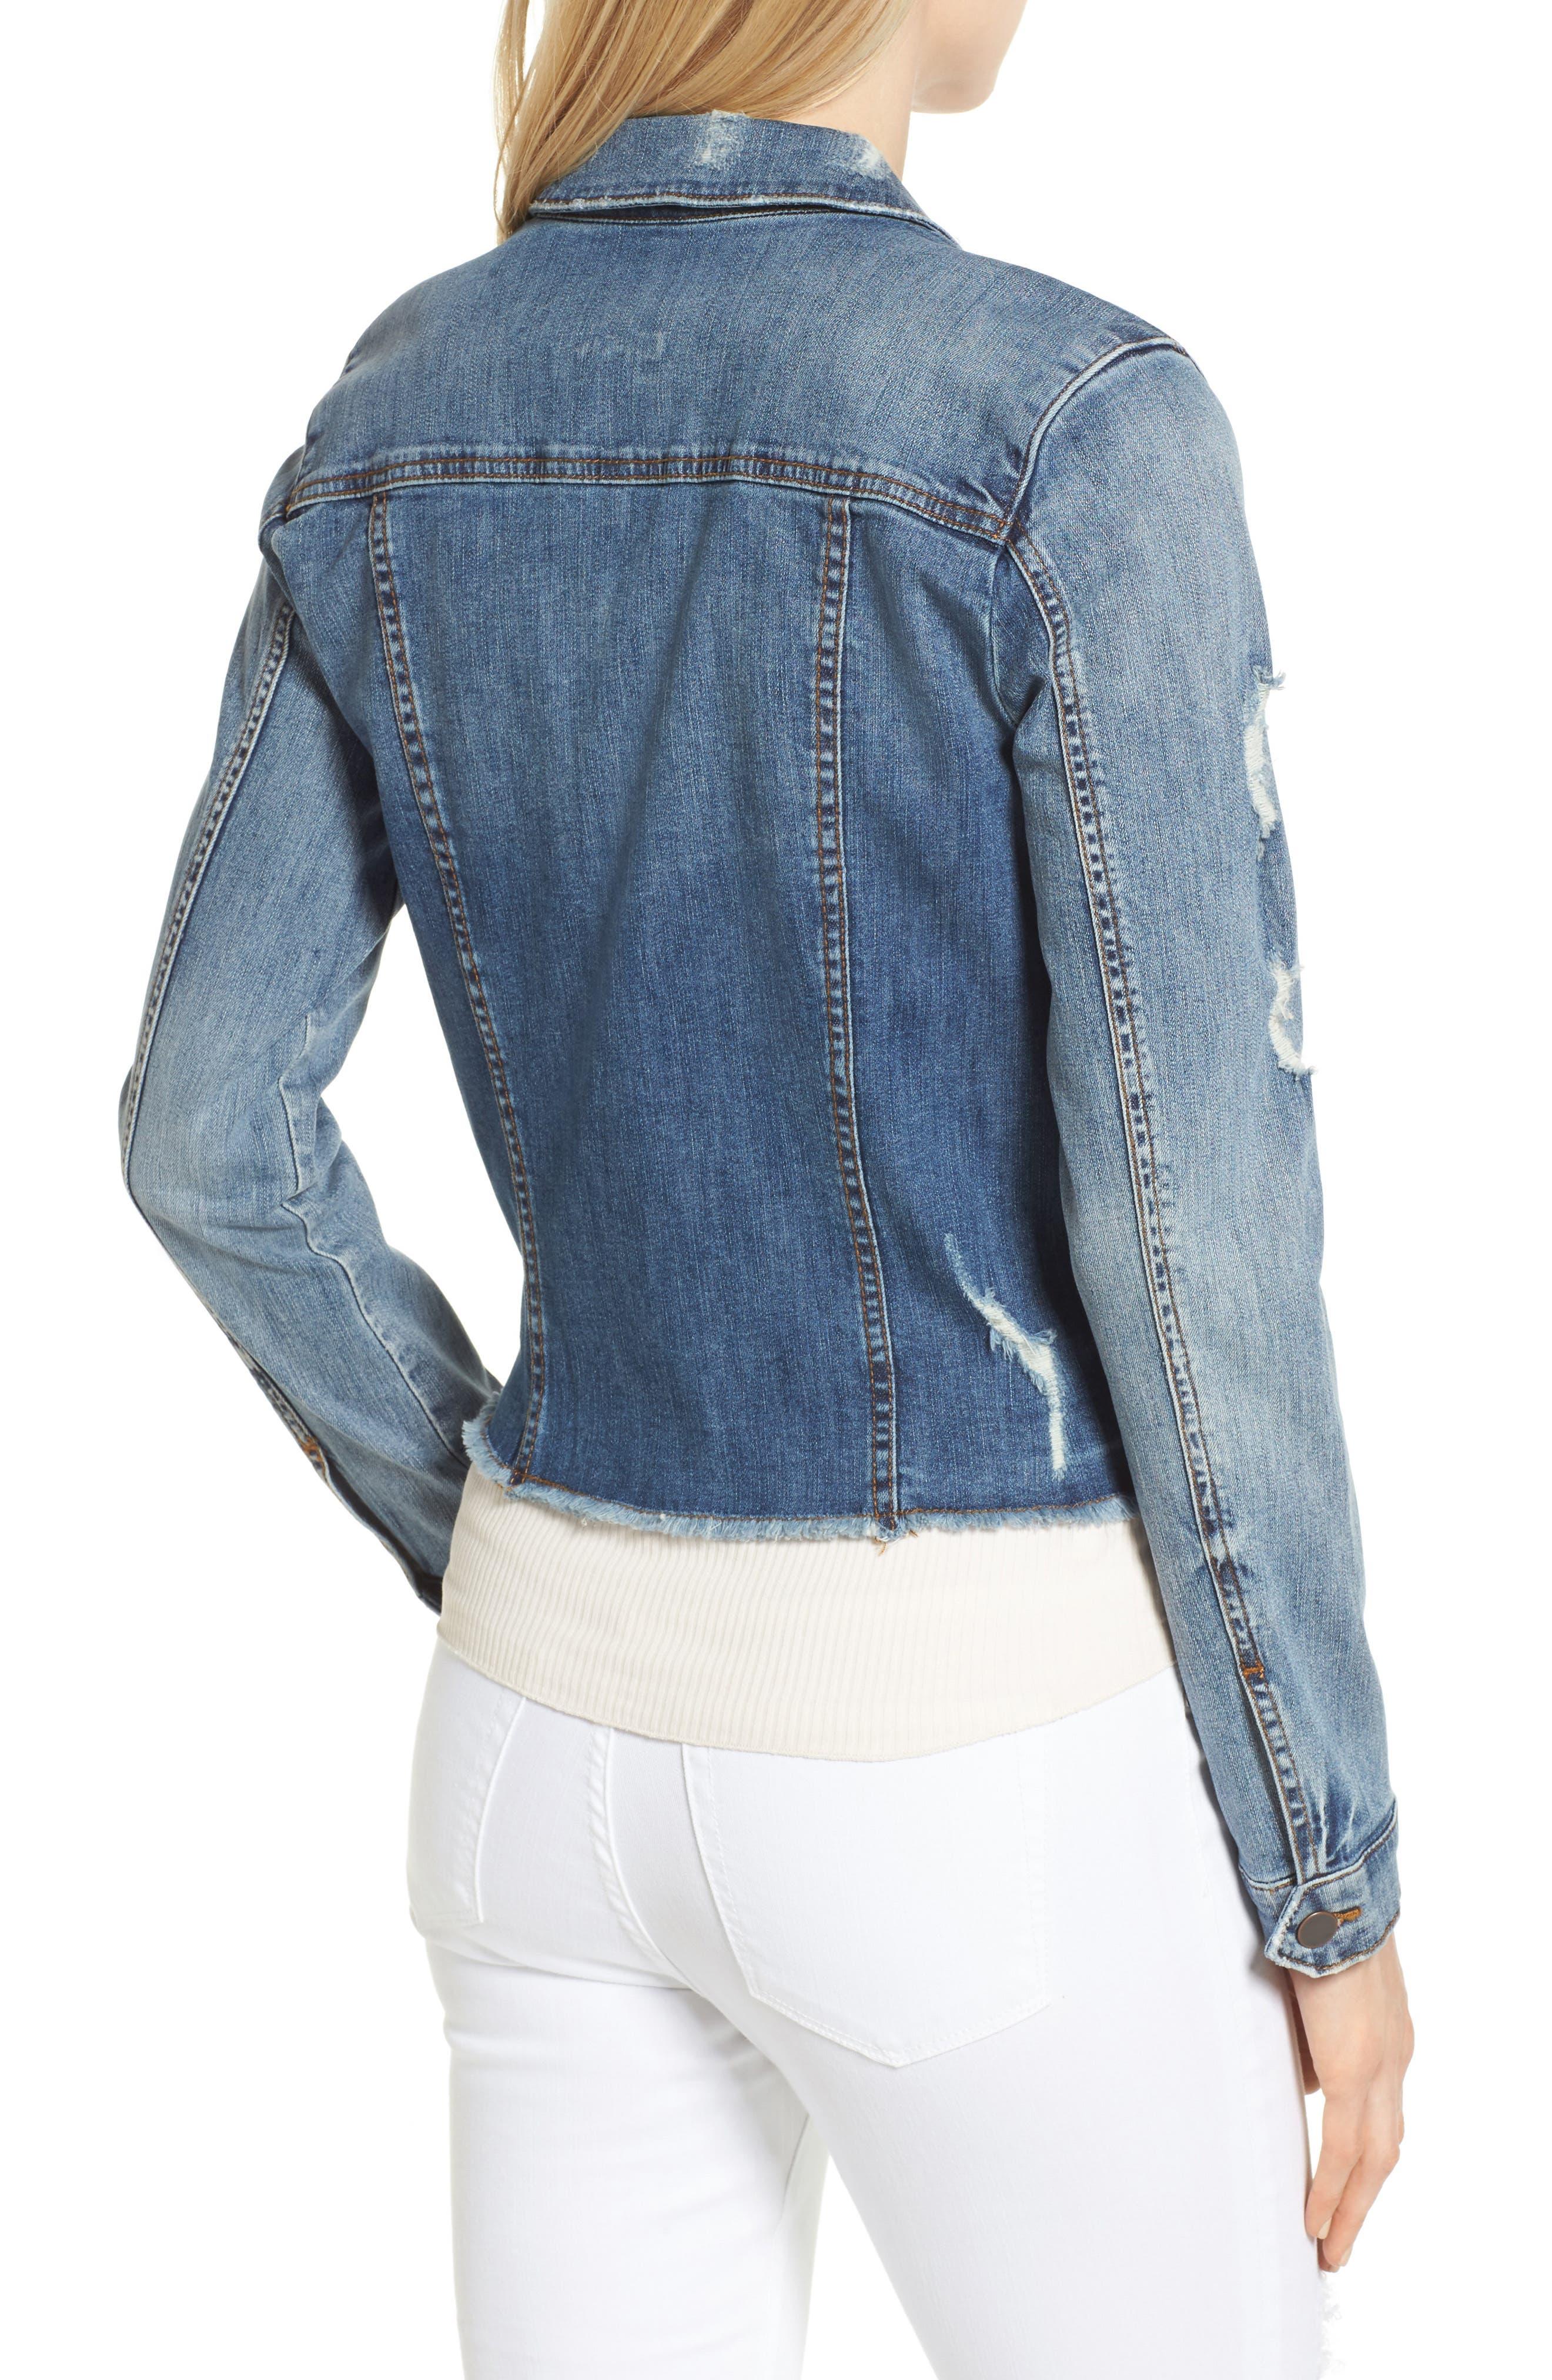 Kara Ripped Denim Jacket,                             Alternate thumbnail 2, color,                             401